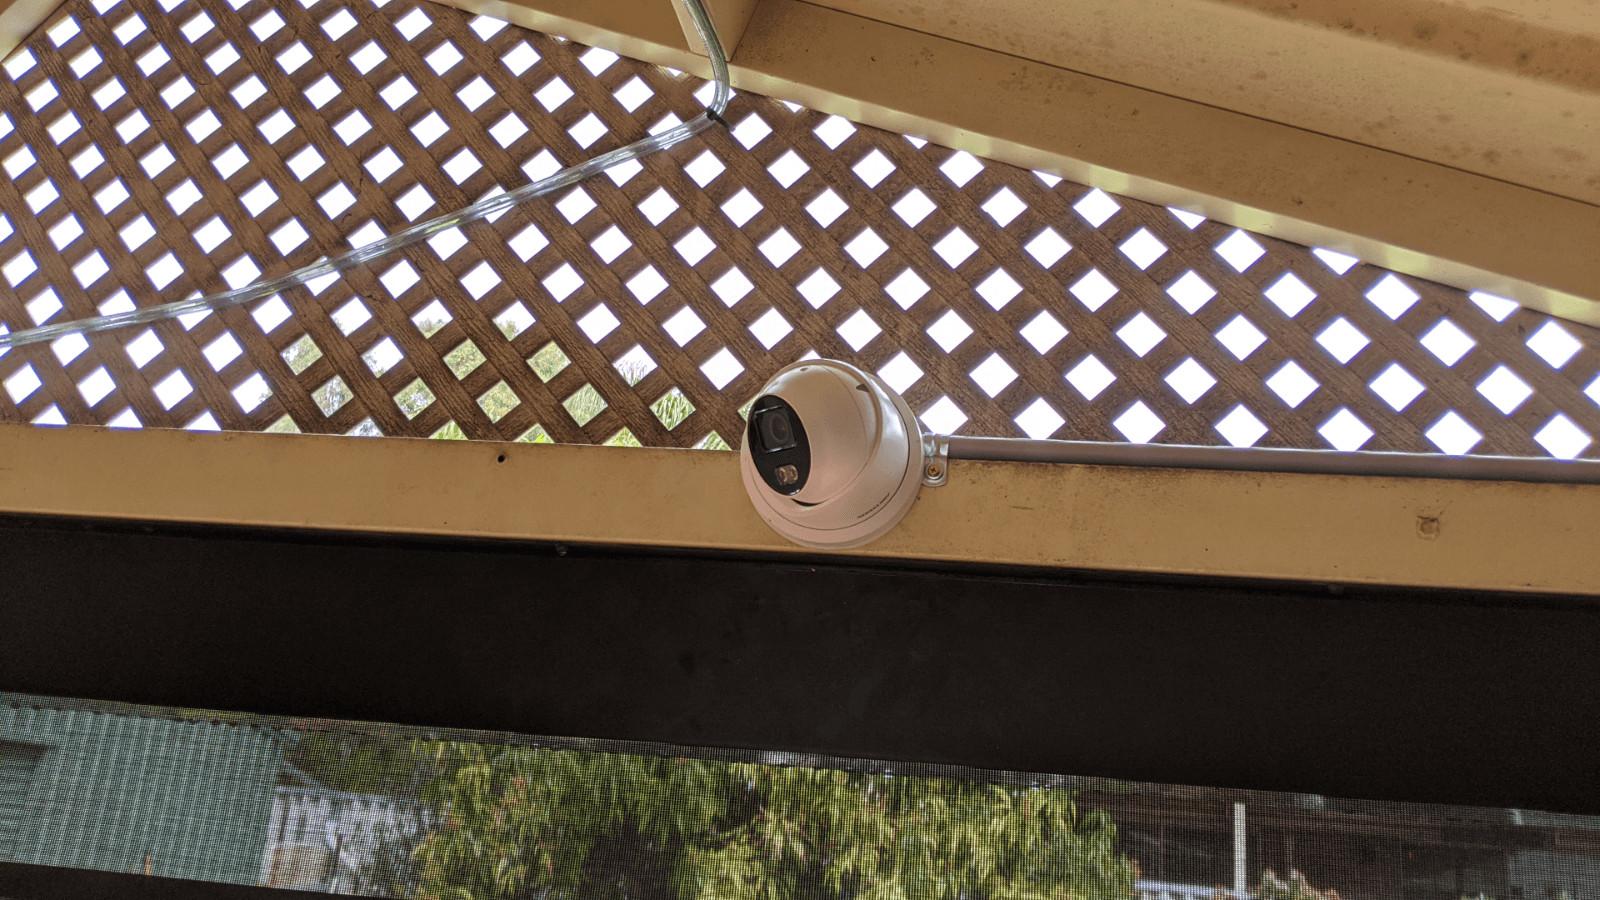 Swan View security cctv install Perth el